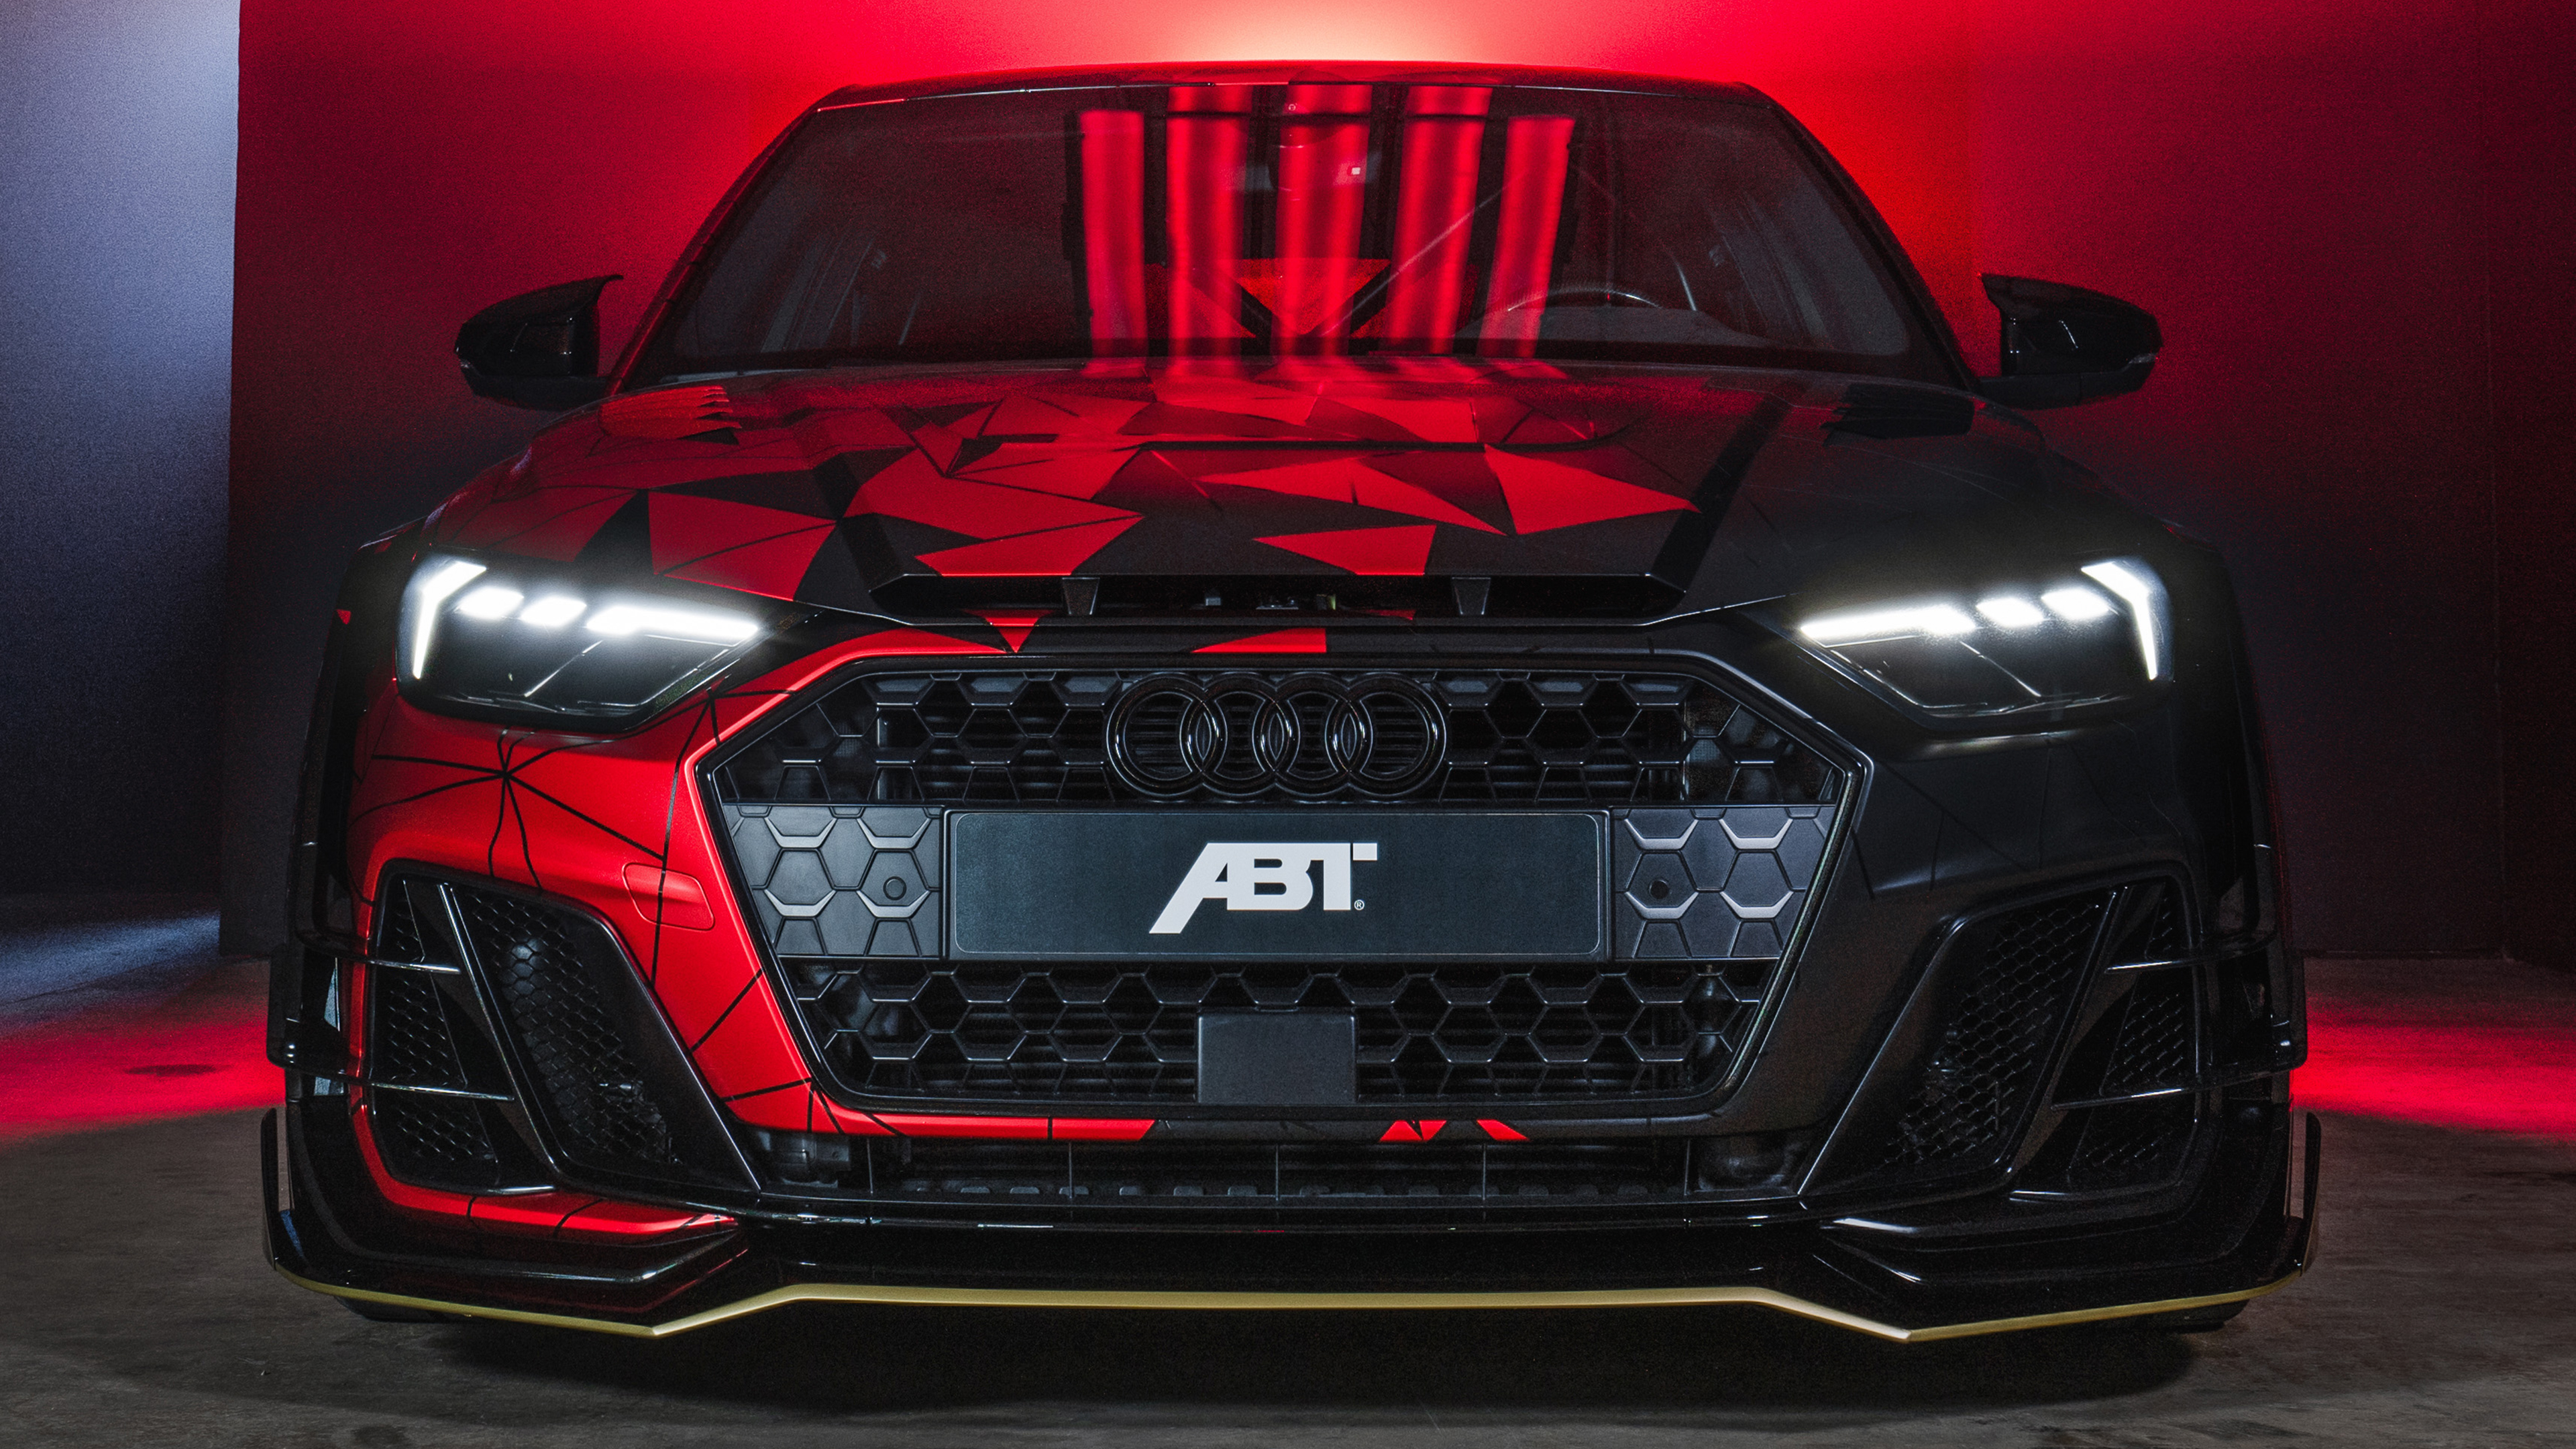 Abt Audi A1 1 Of 1 2019 4k Wallpaper Hd Car Wallpapers Id 13381